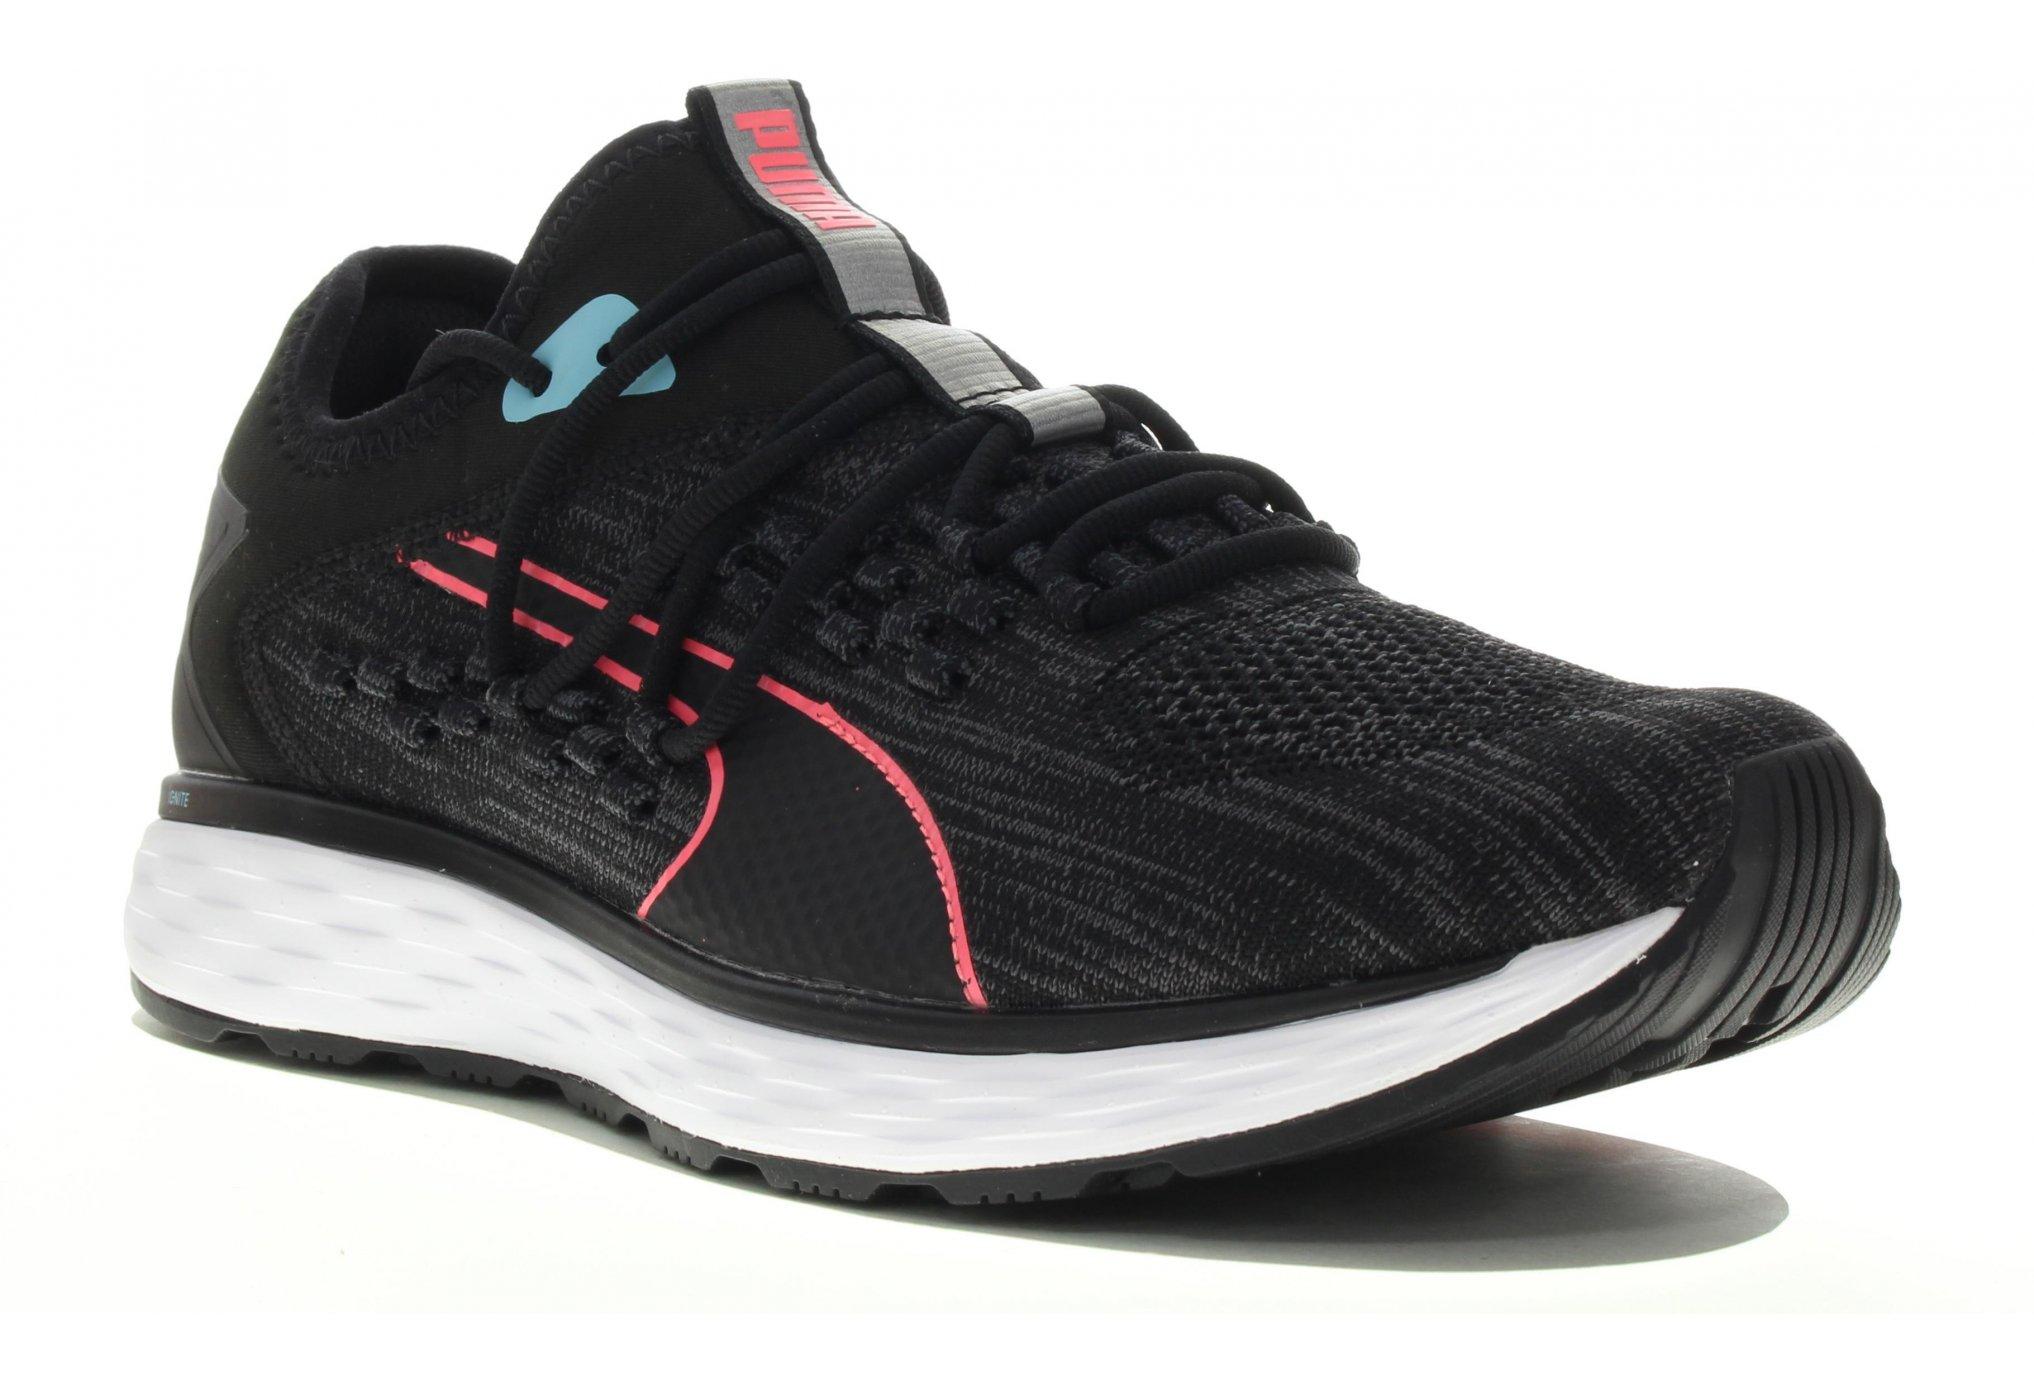 Puma Speed 600 Fusefit W Chaussures running femme